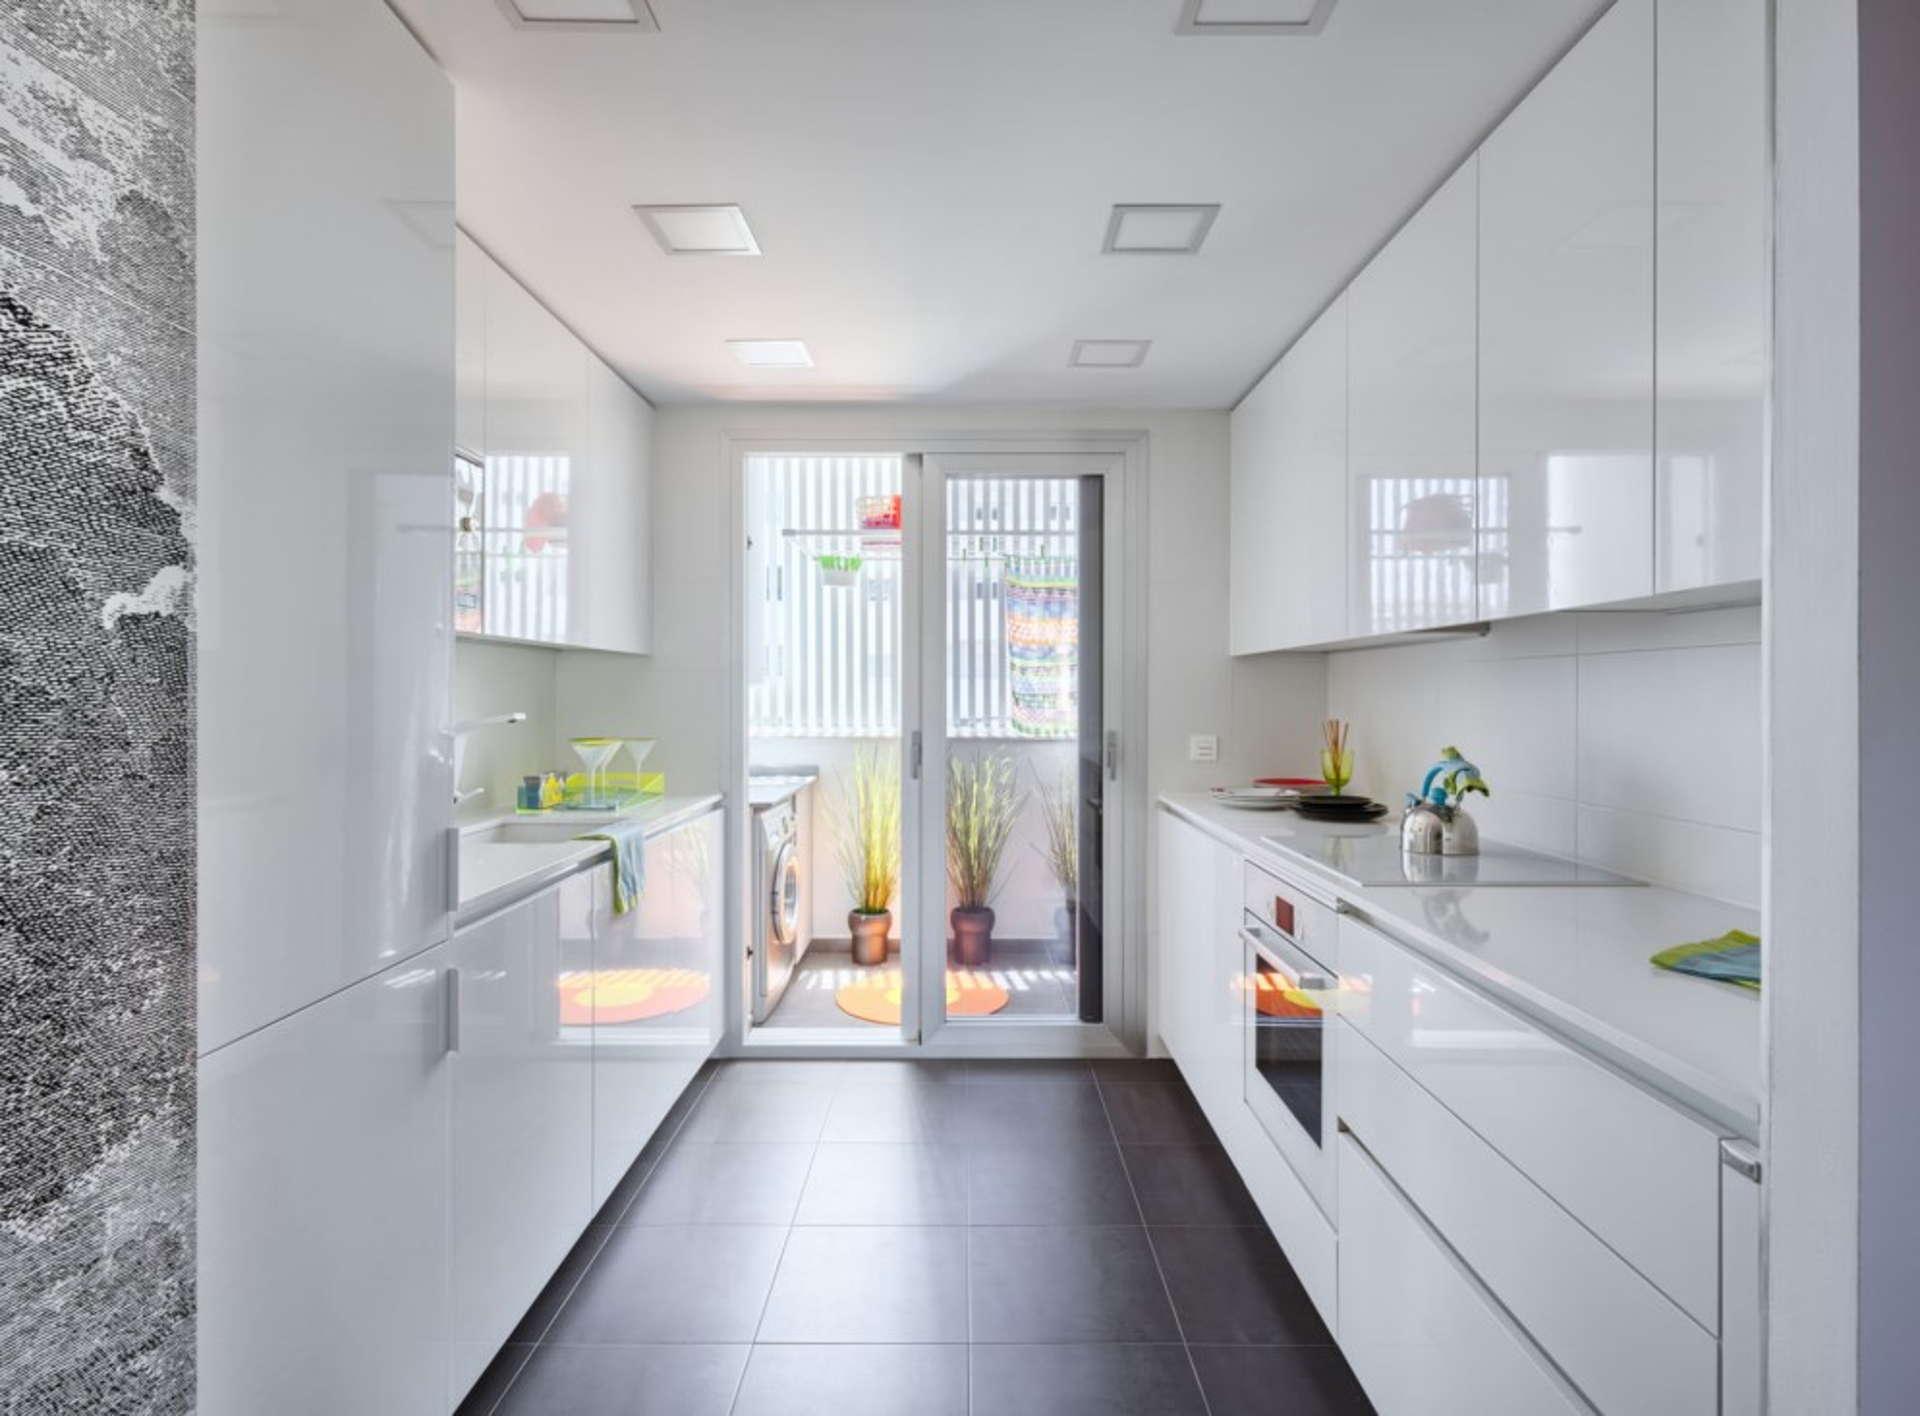 New Off Plan 3 Bedroom Apartment For Sale In Fuengirola Marbella Realista